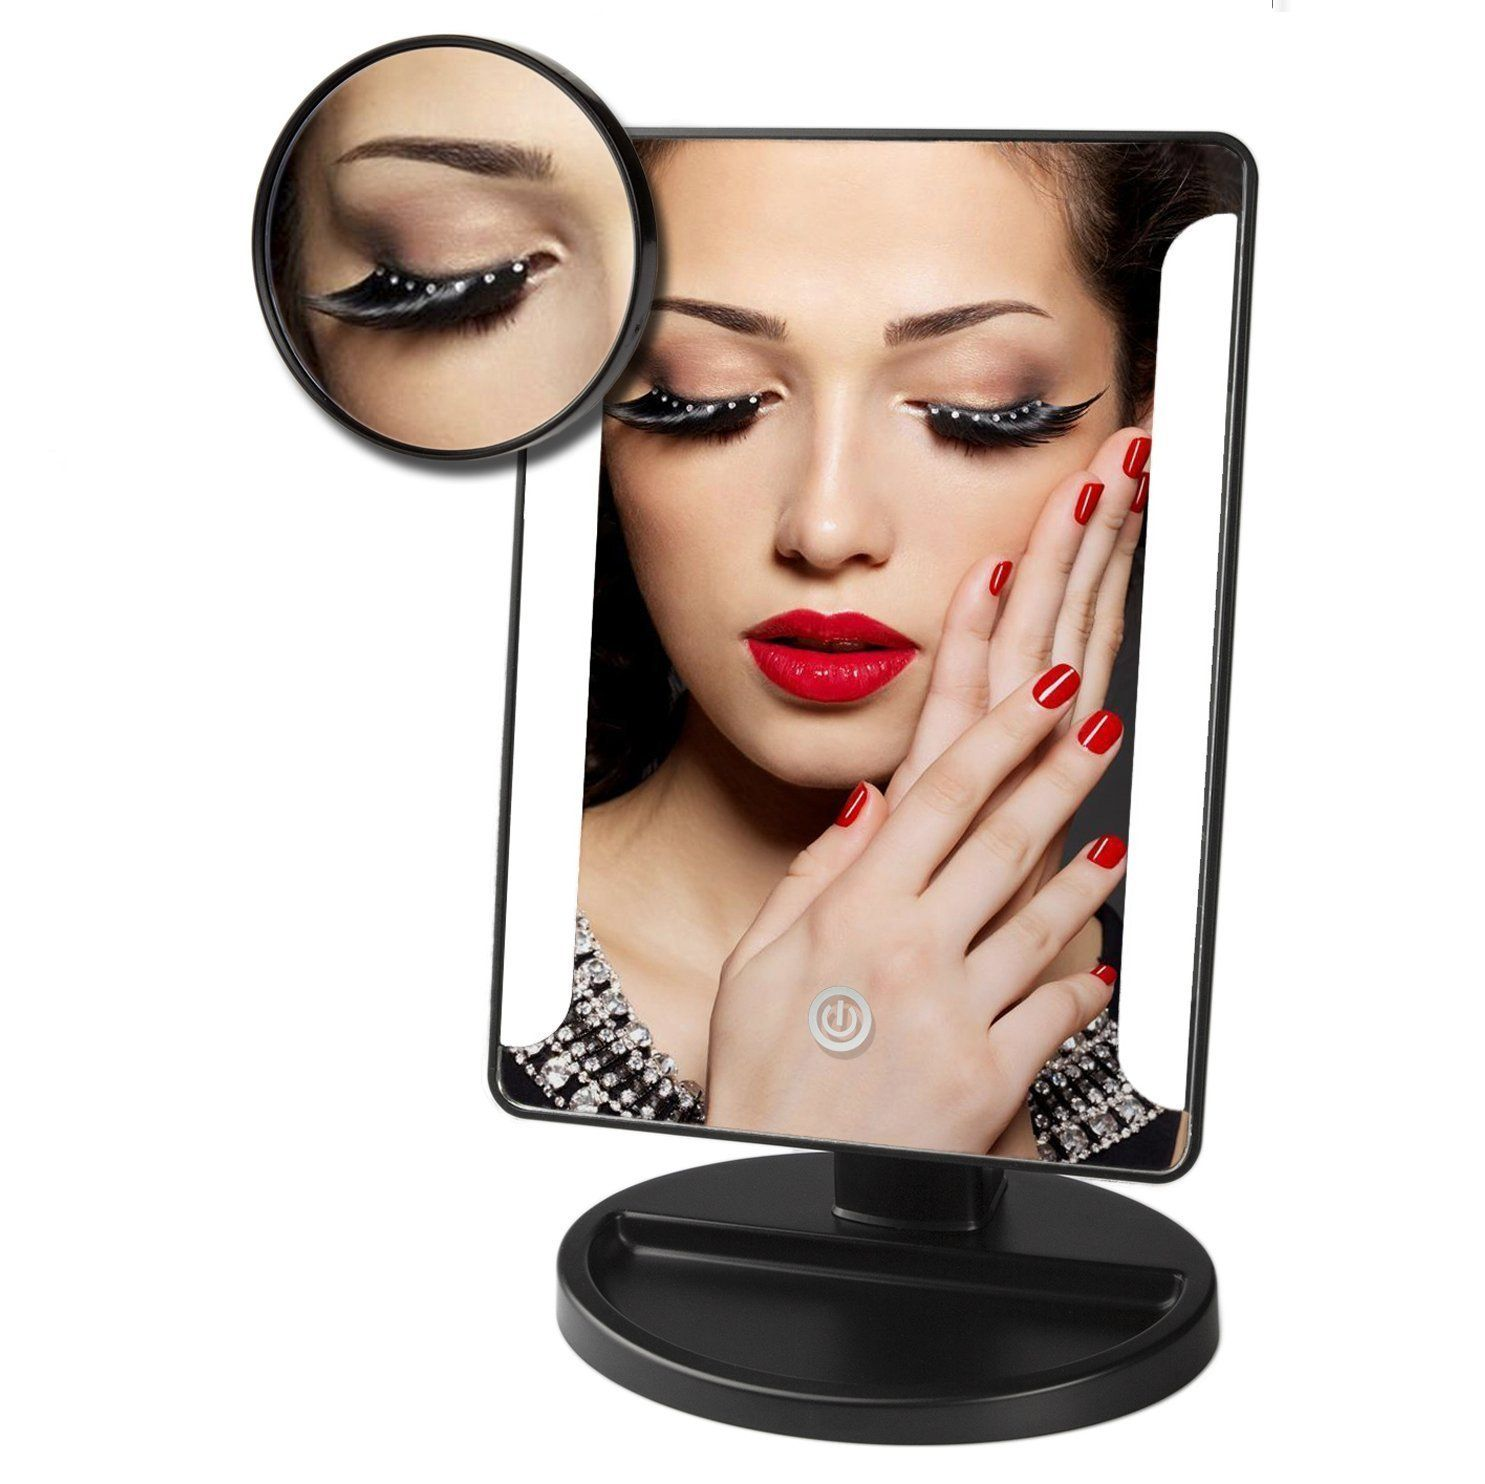 IEKA Tabletop LED Lighted Vanity Mirror / Natural Bright